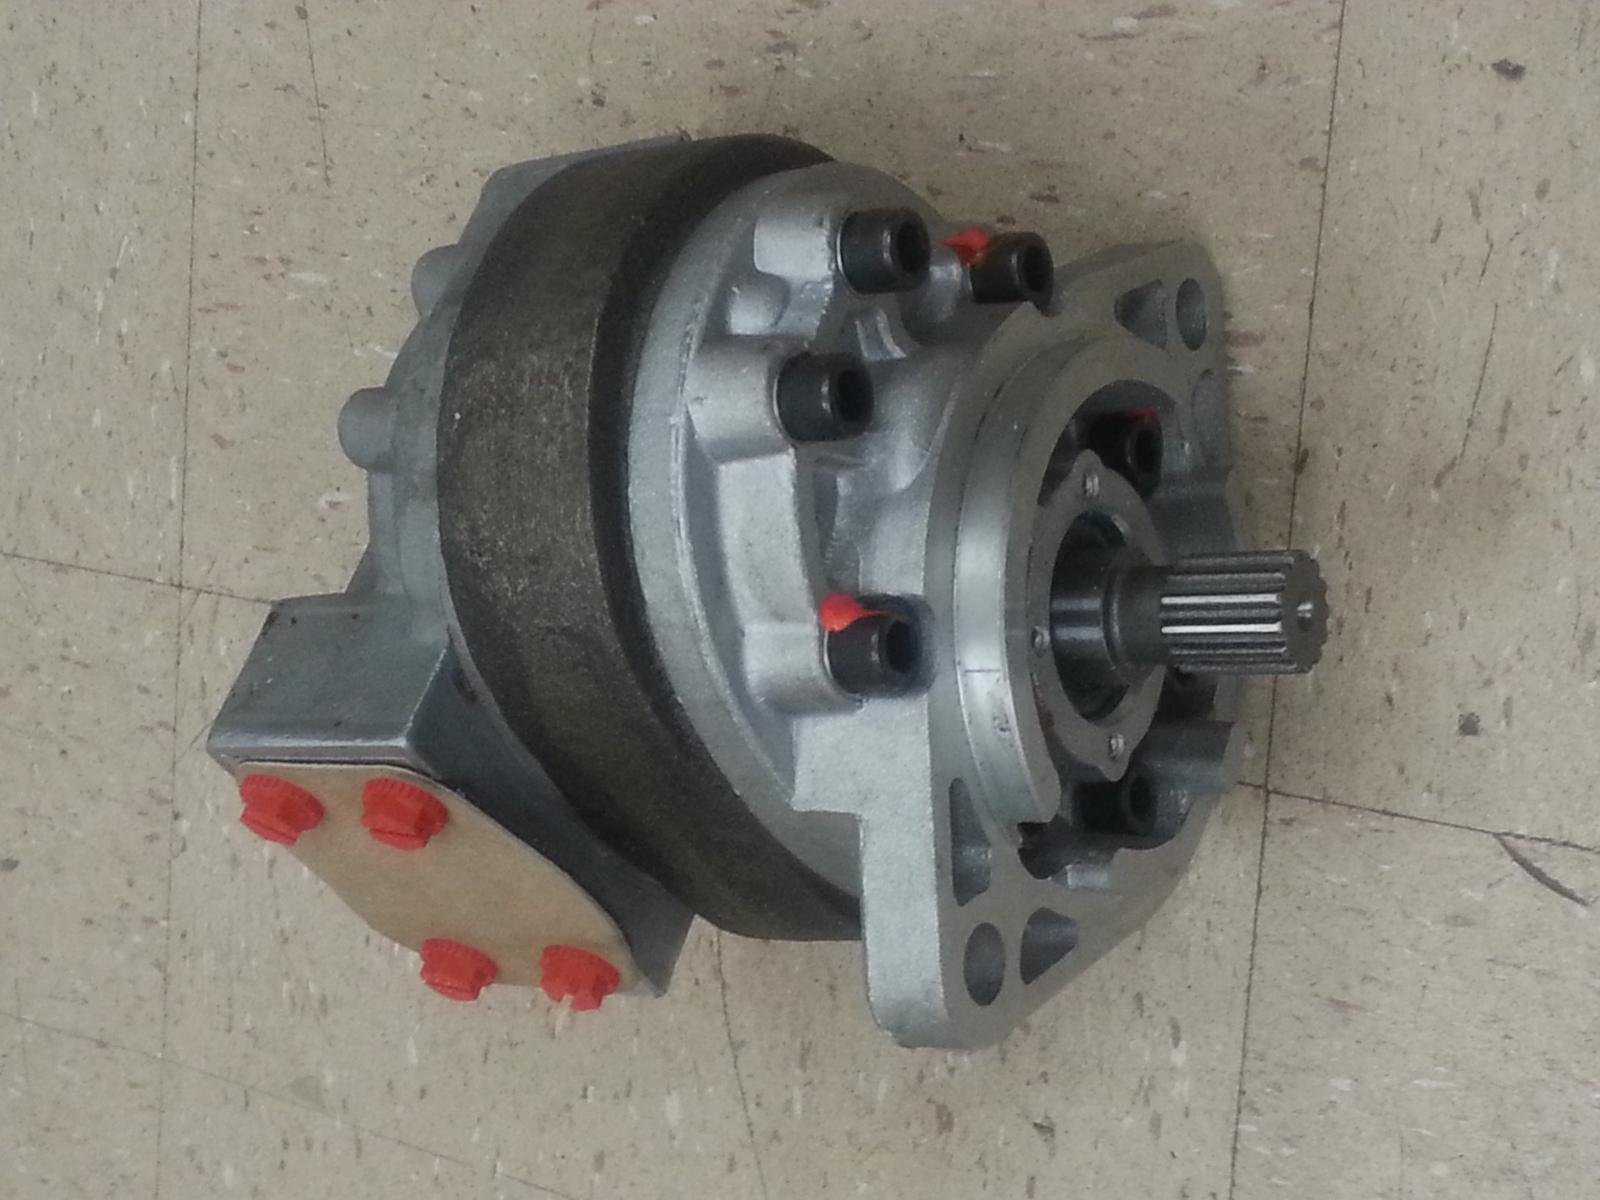 Ford New Holland Loader Backhoe Hydraulic Pump 550 535 555